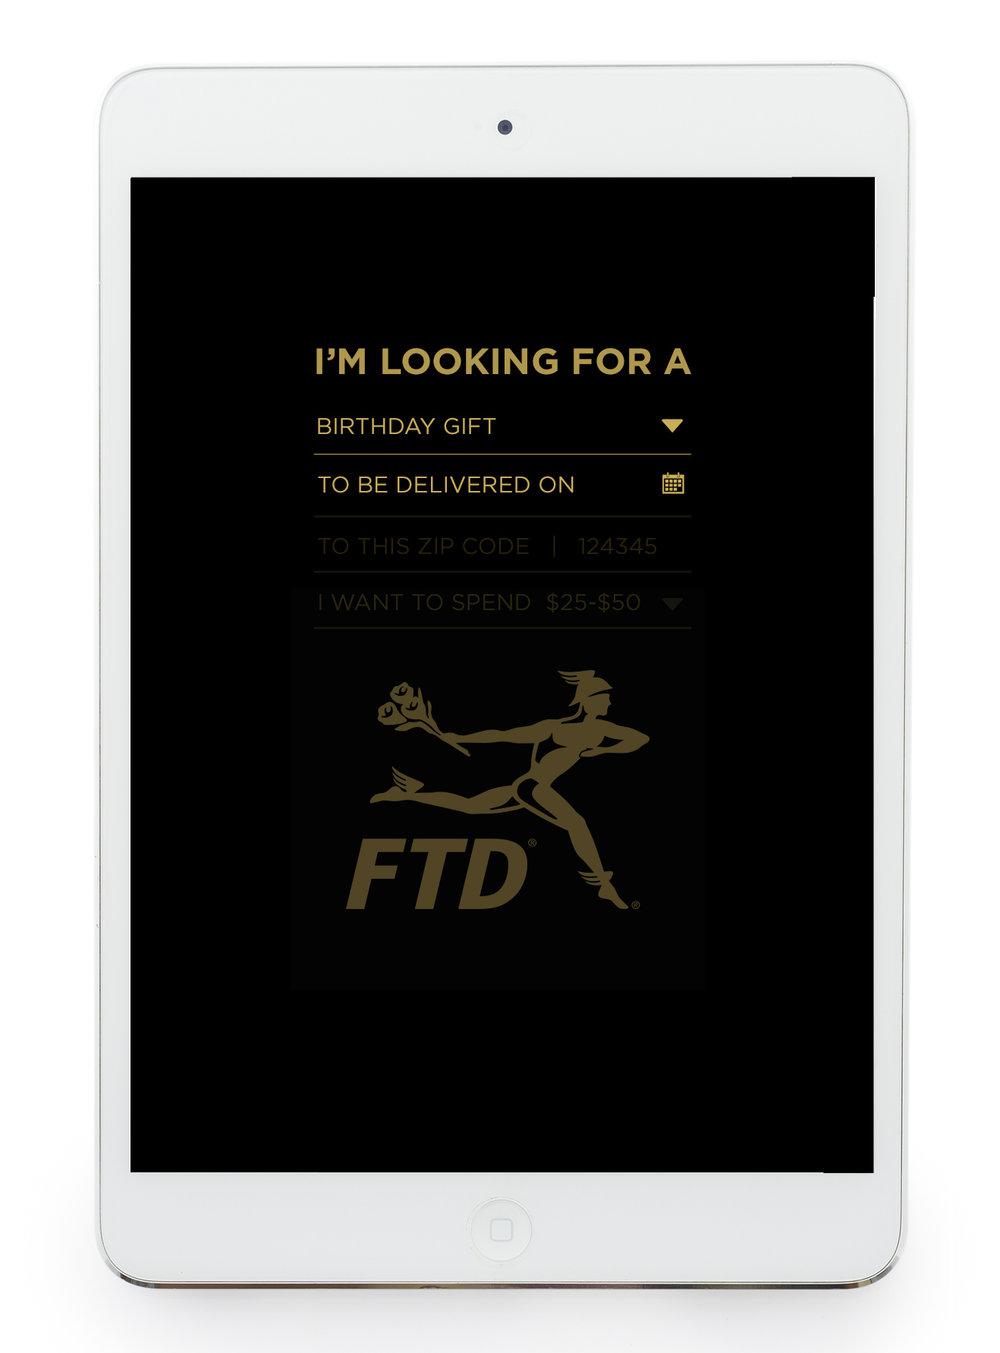 FTD_Flo_Dir_Inteface_02B.jpg